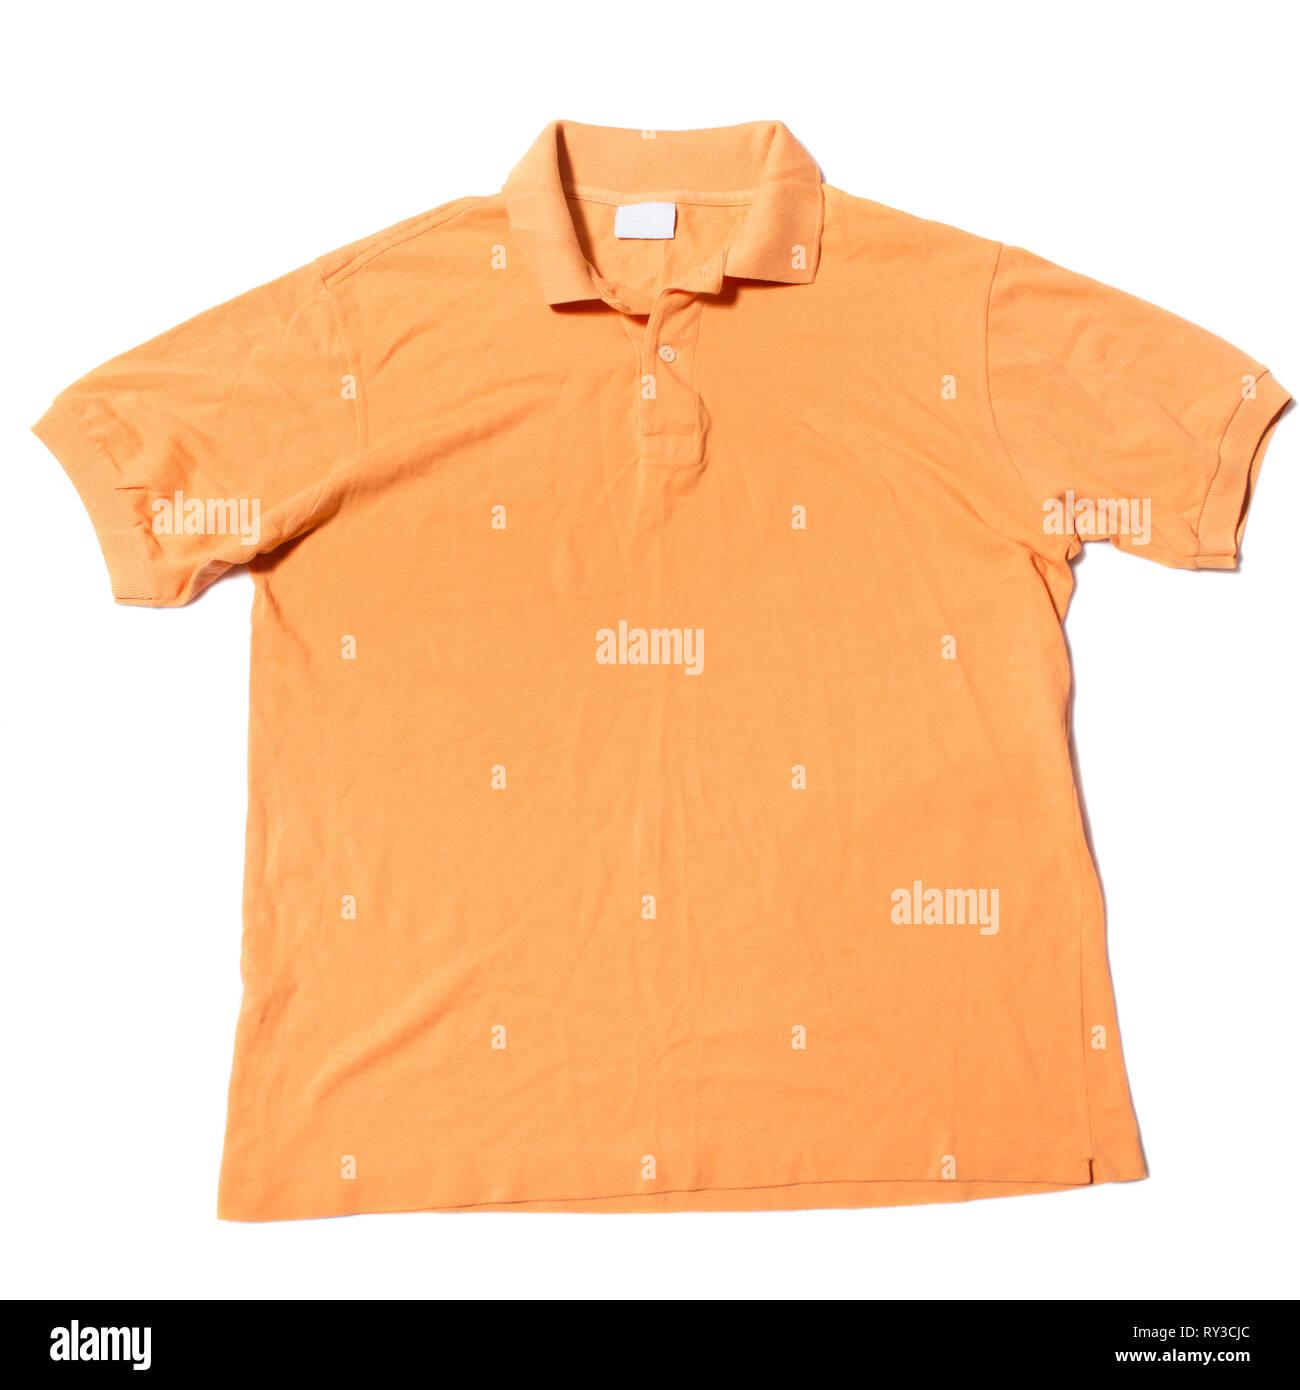 Camiseta manga corta polo Imagen De Stock